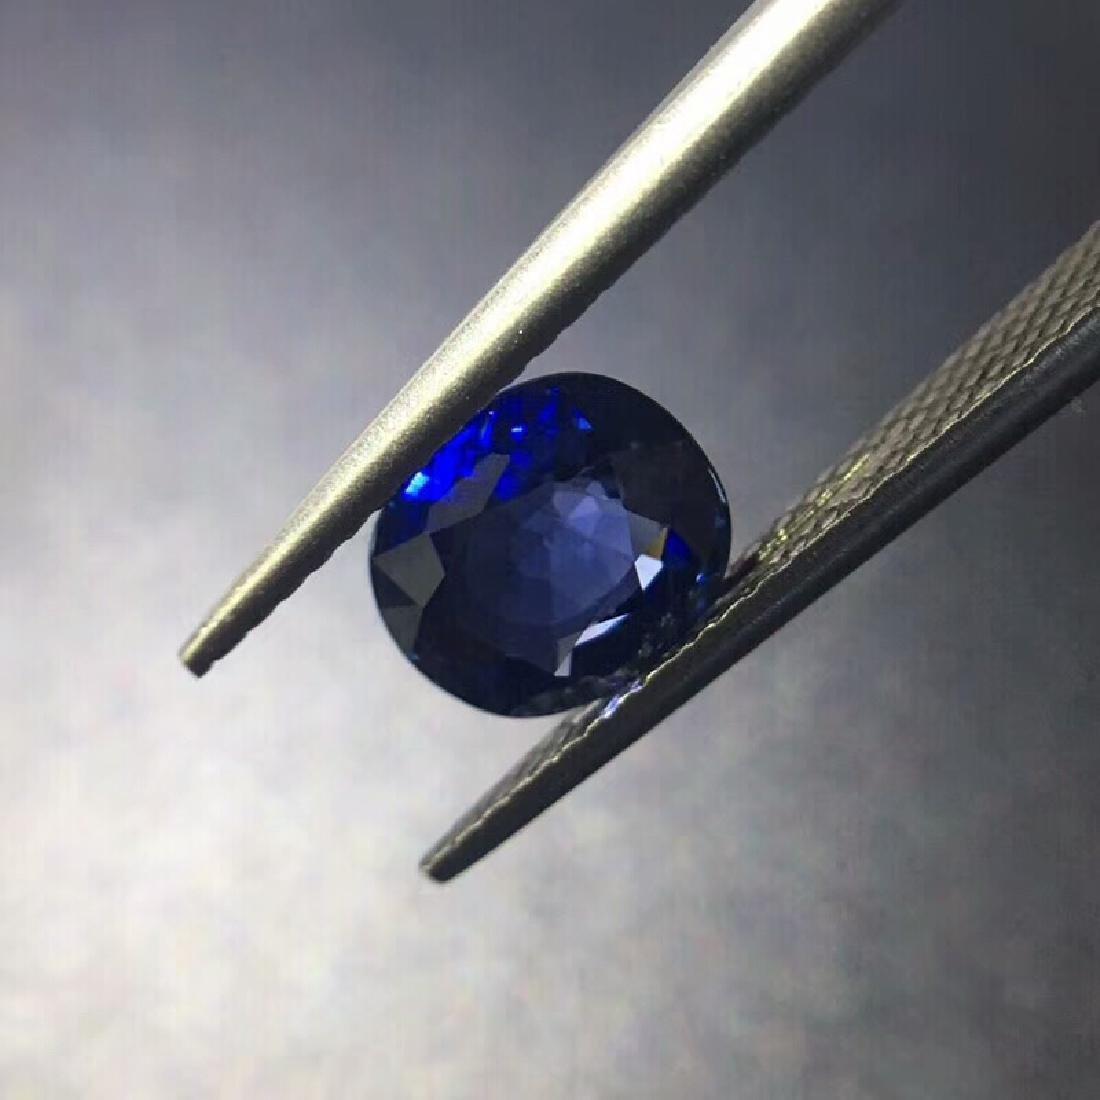 1.68 ct Sapphire 7.5*6.4*3.6 mm Oval Cut - 3